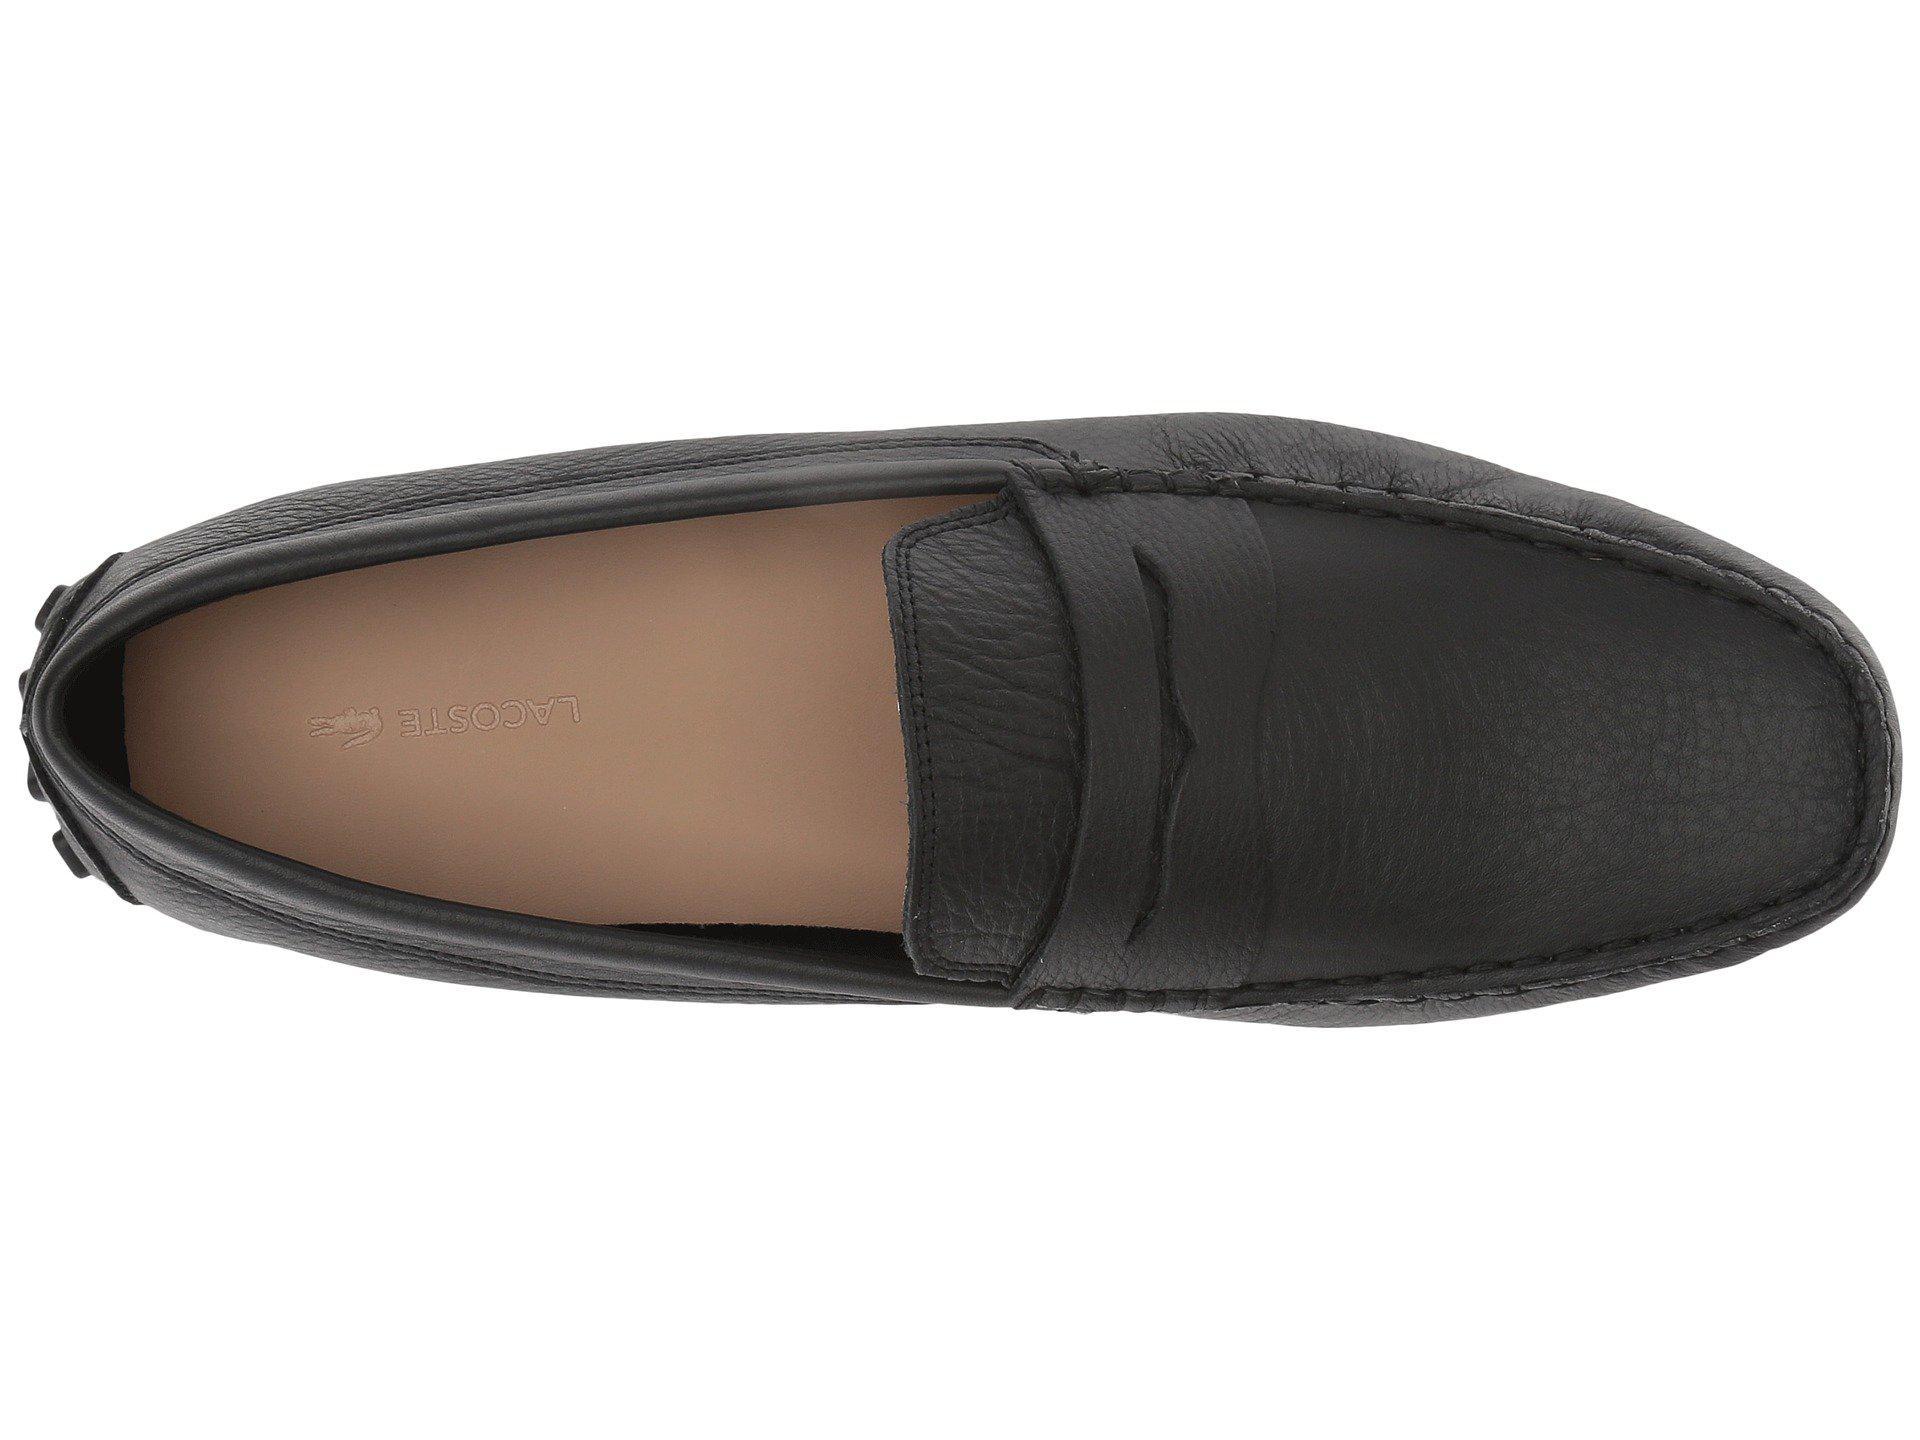 615ae60cd165 Lacoste - Black Concours 118 1 P (tan) Men s Shoes for Men - Lyst. View  fullscreen